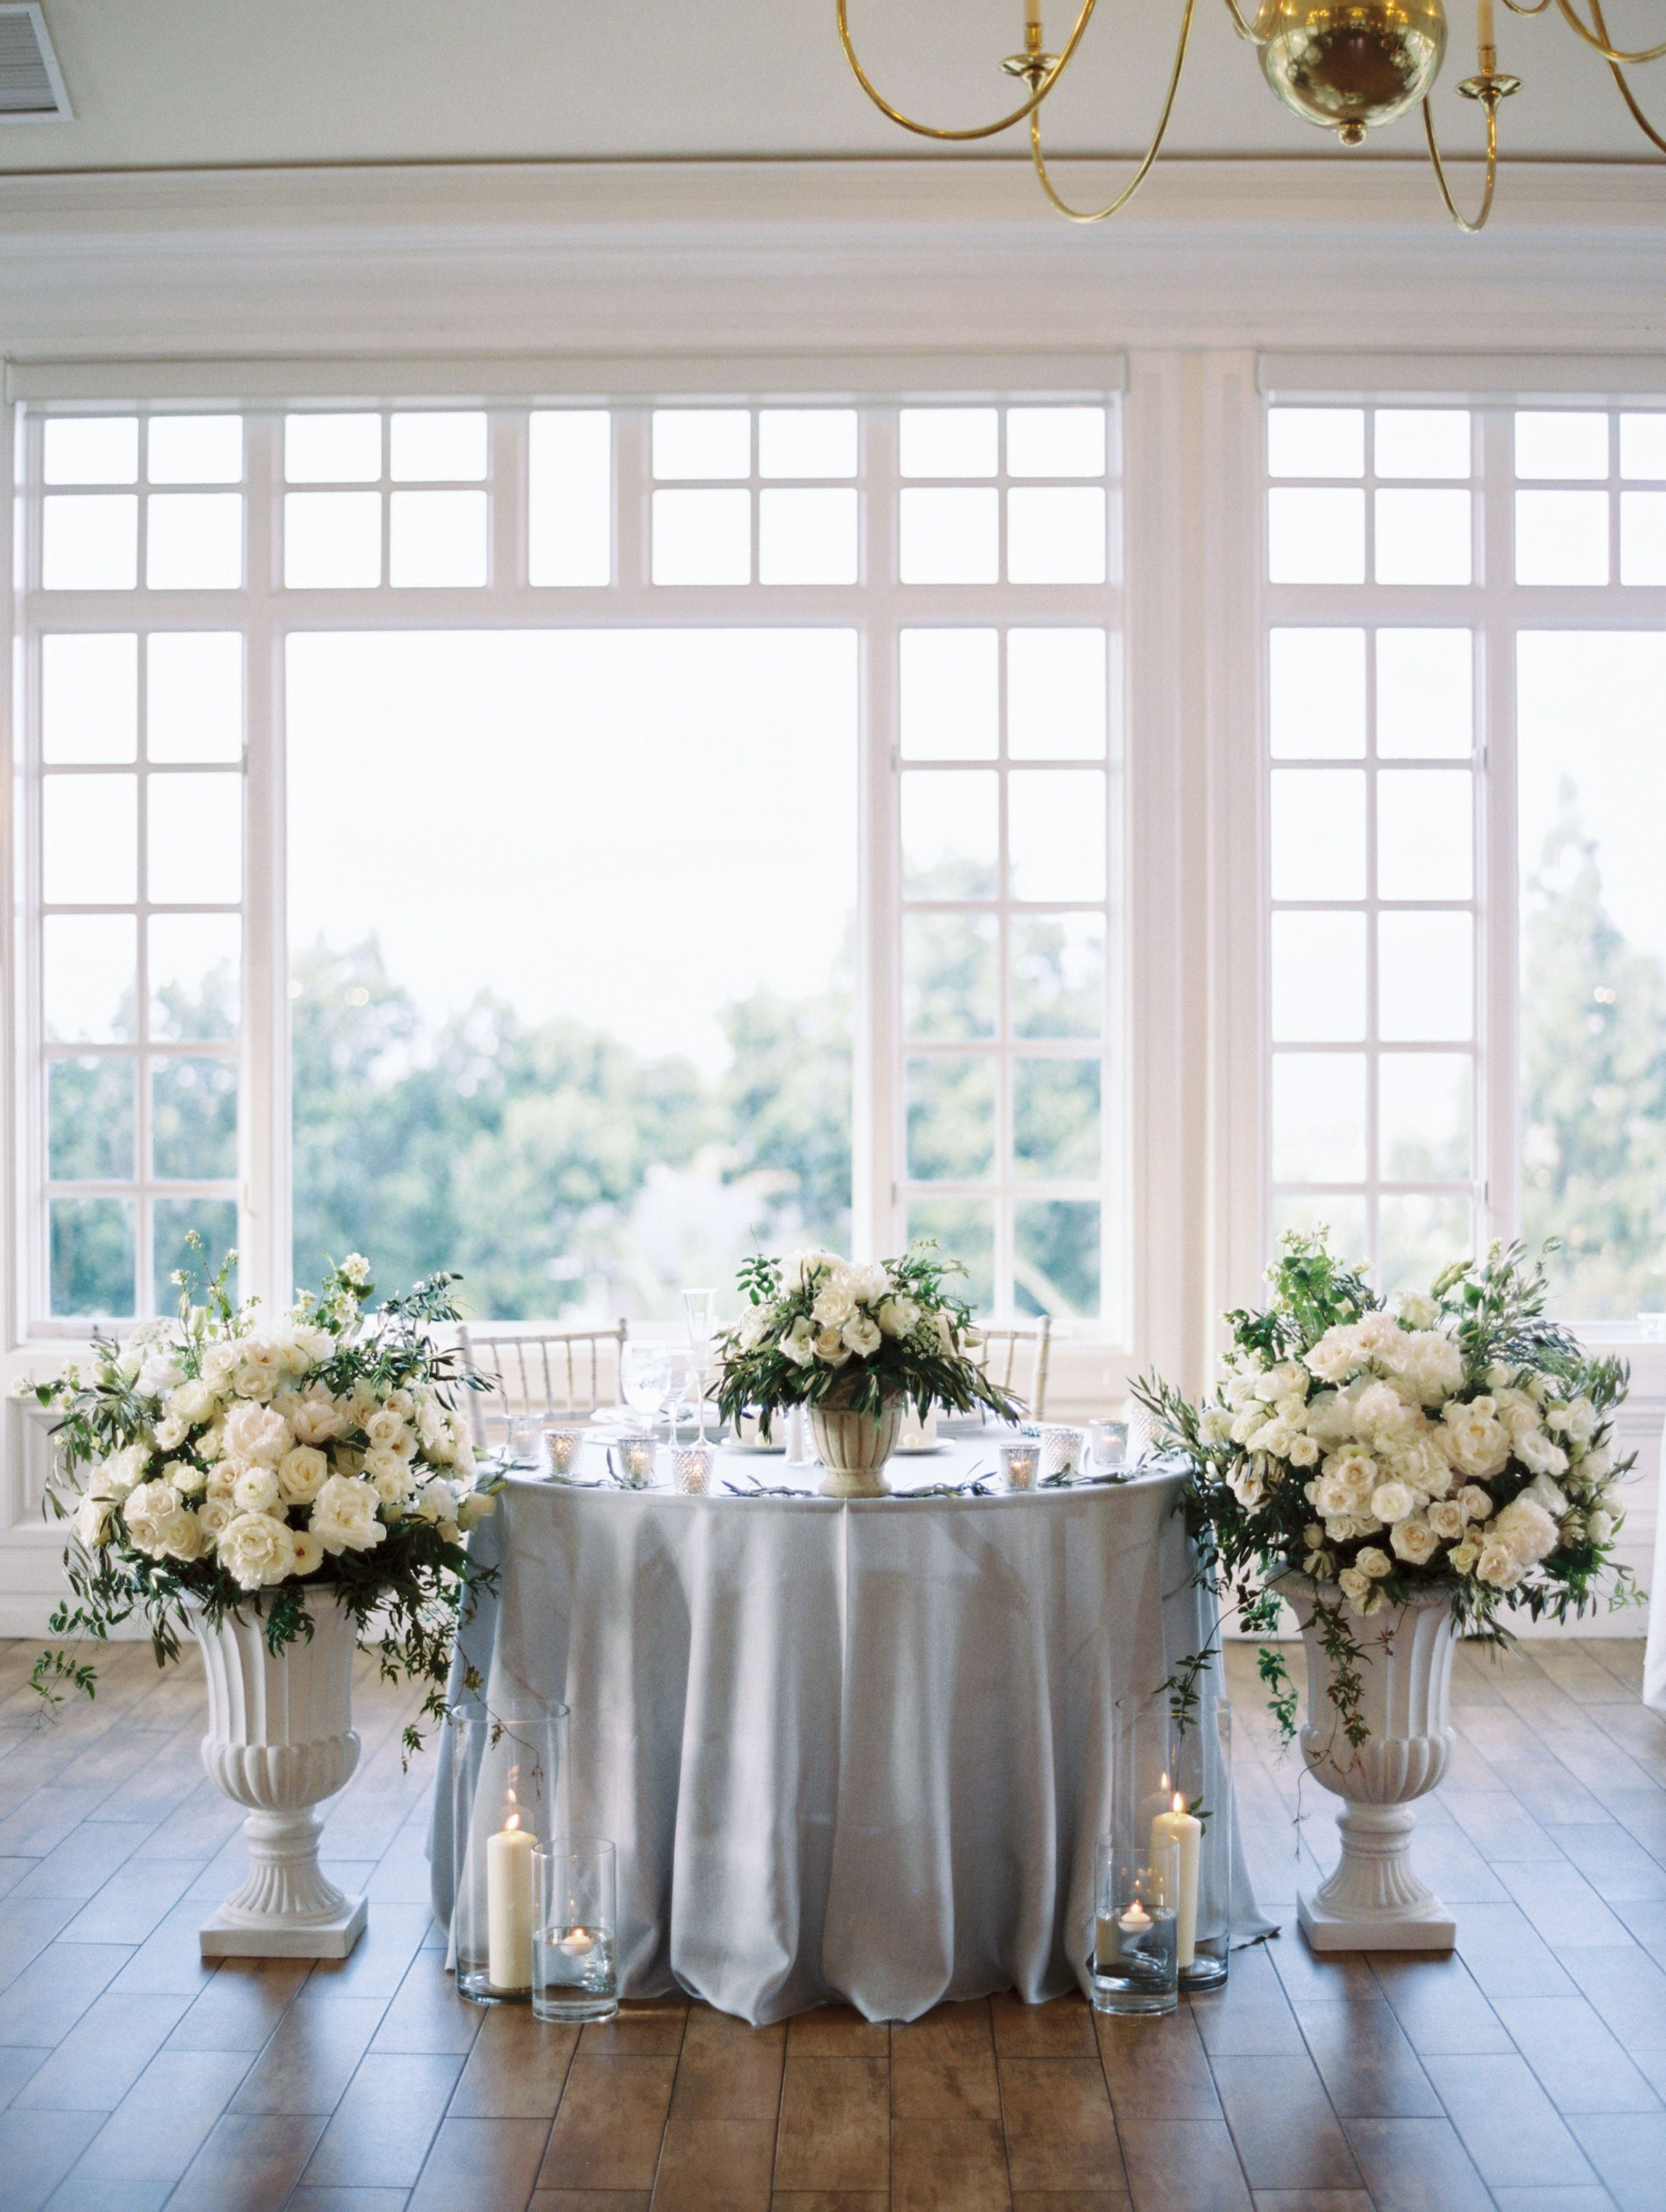 Inexpensive Wedding Details That Make a Big Impact   Carmel mountain ...